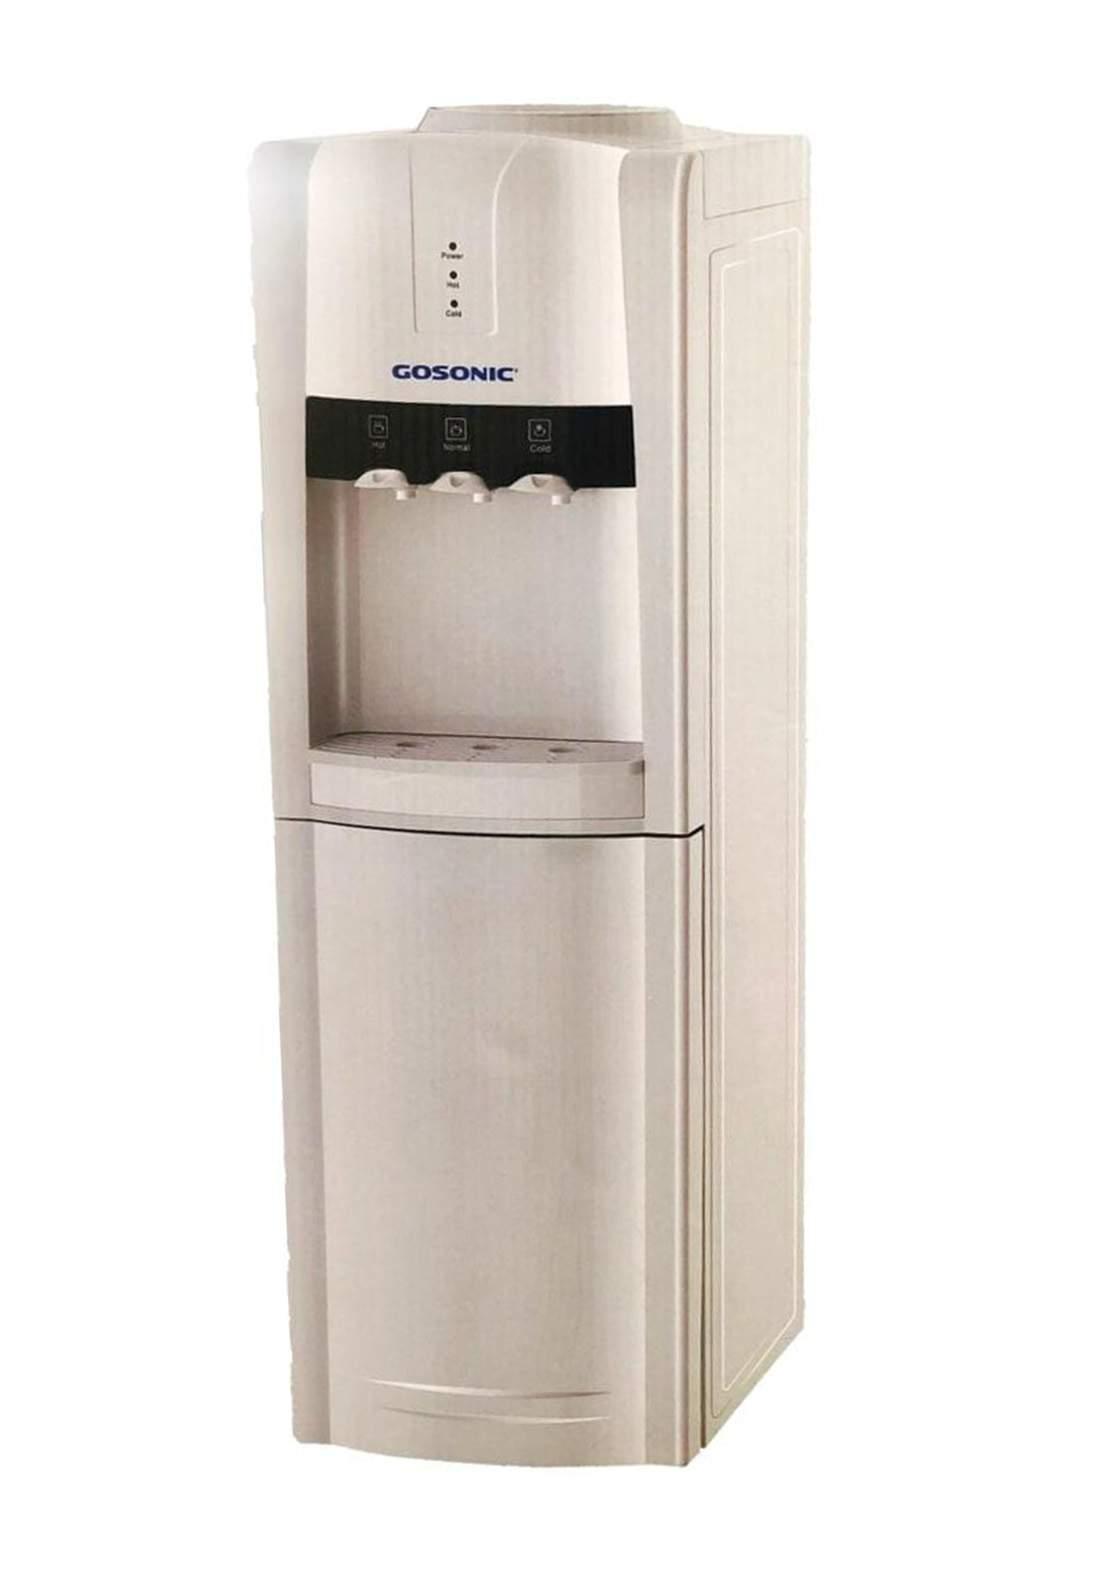 Gosonic GWD-523 Water Dispenser  براد مياه